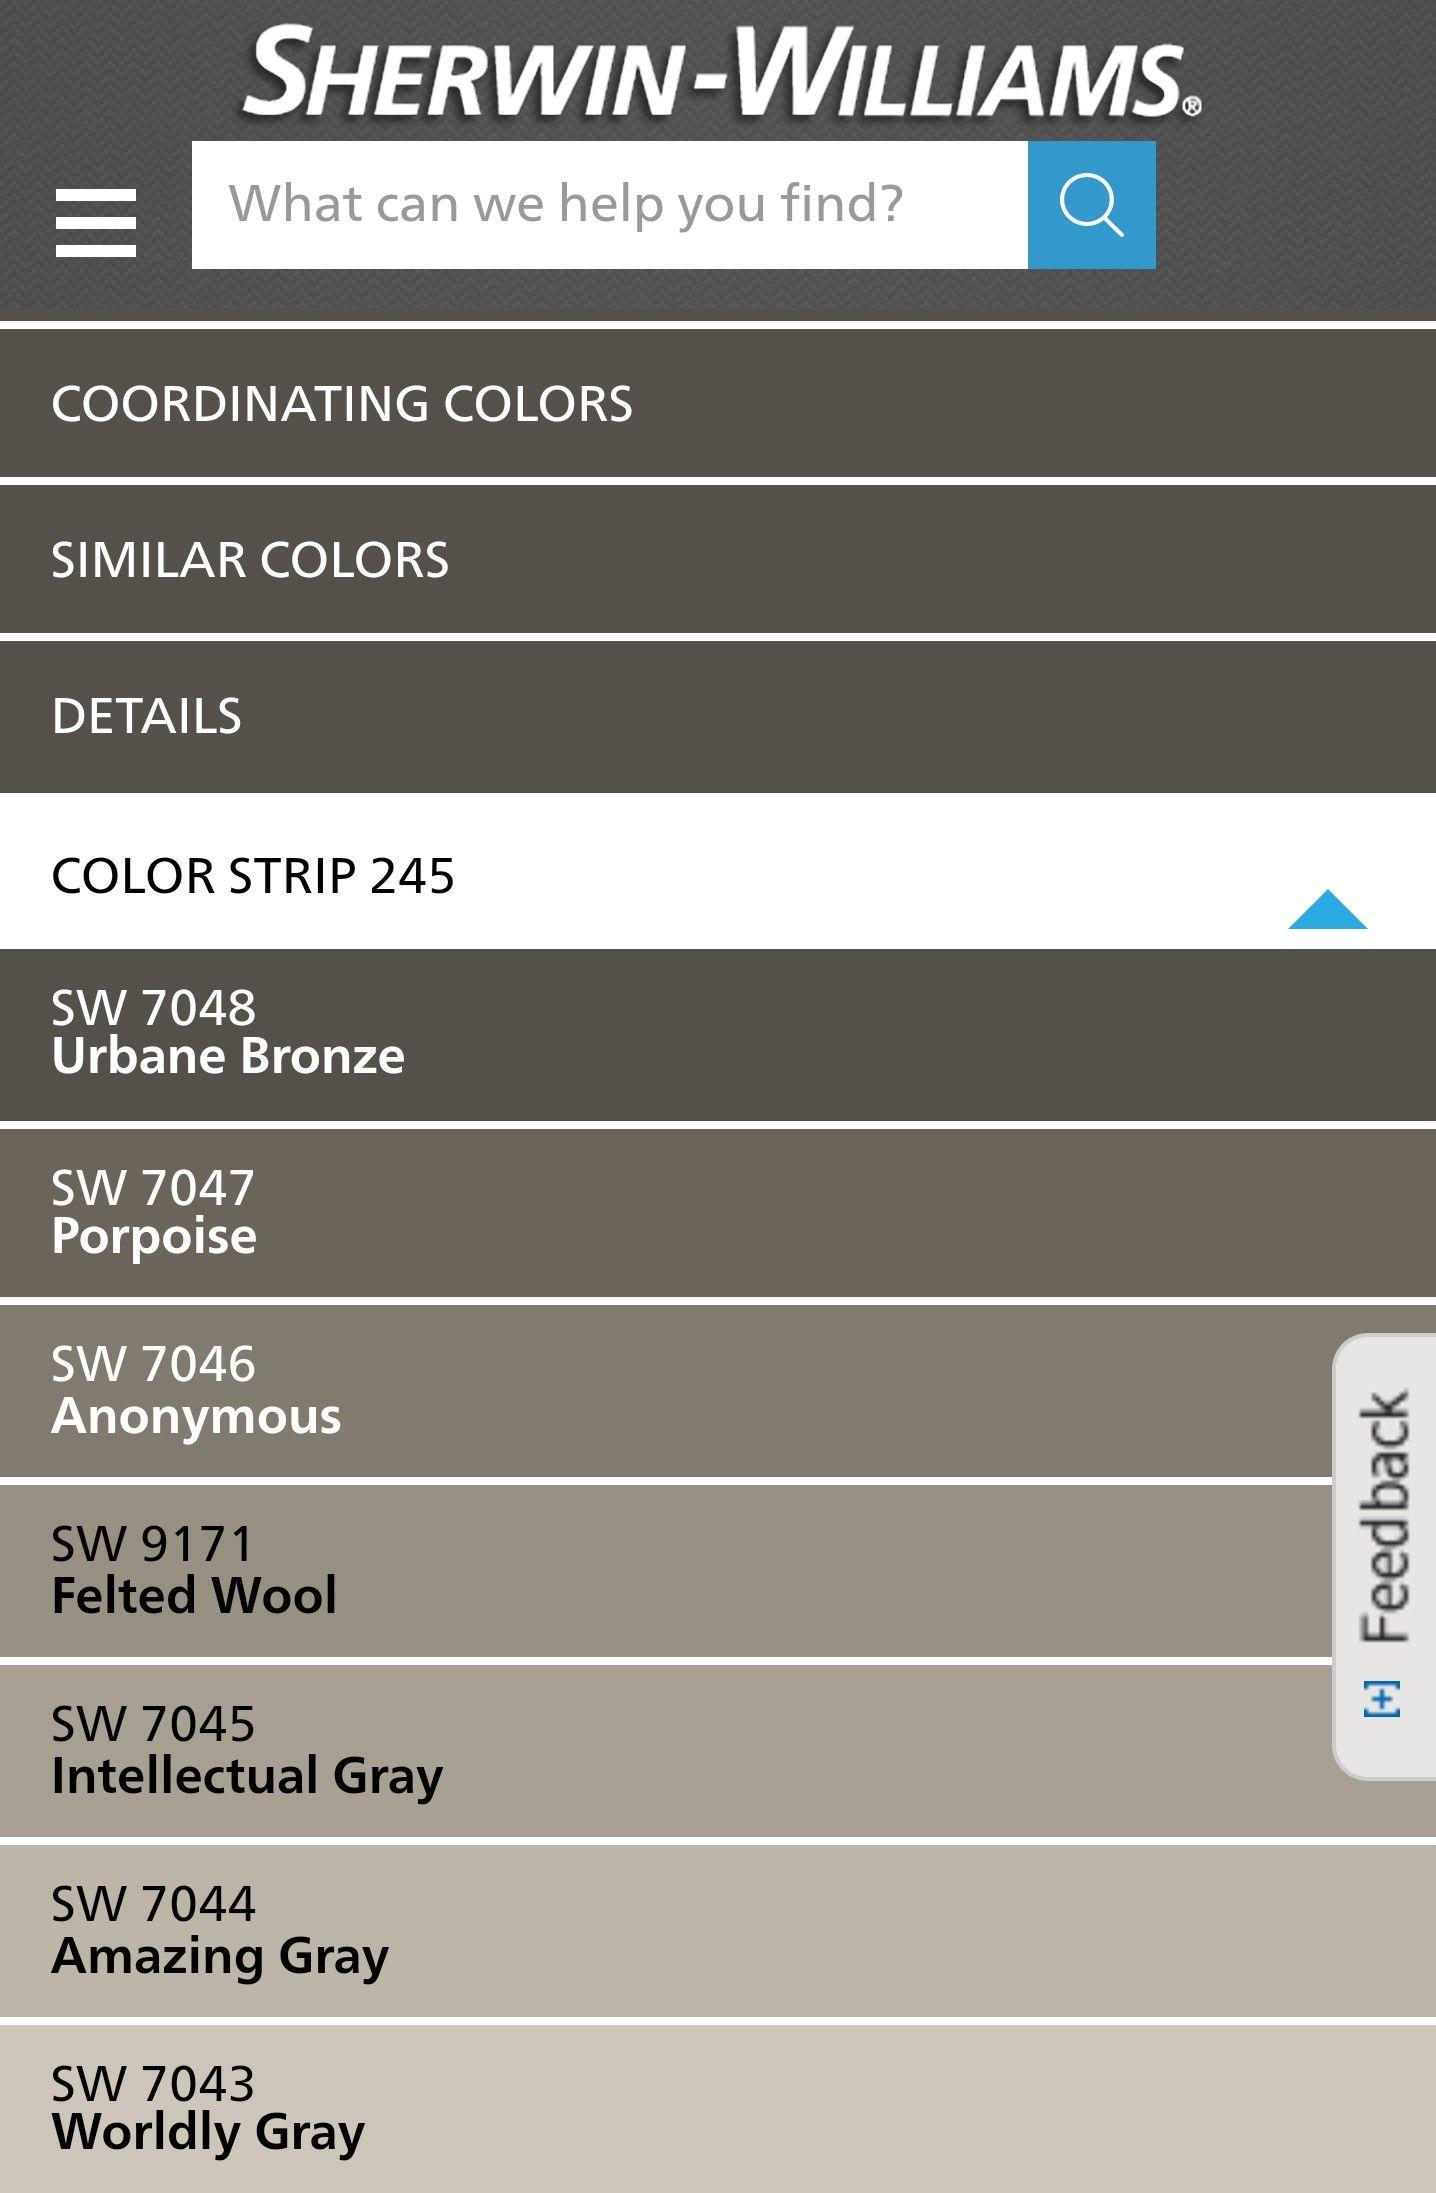 Sherwin Williams Urbane Bronze Color Strip Novocom Top